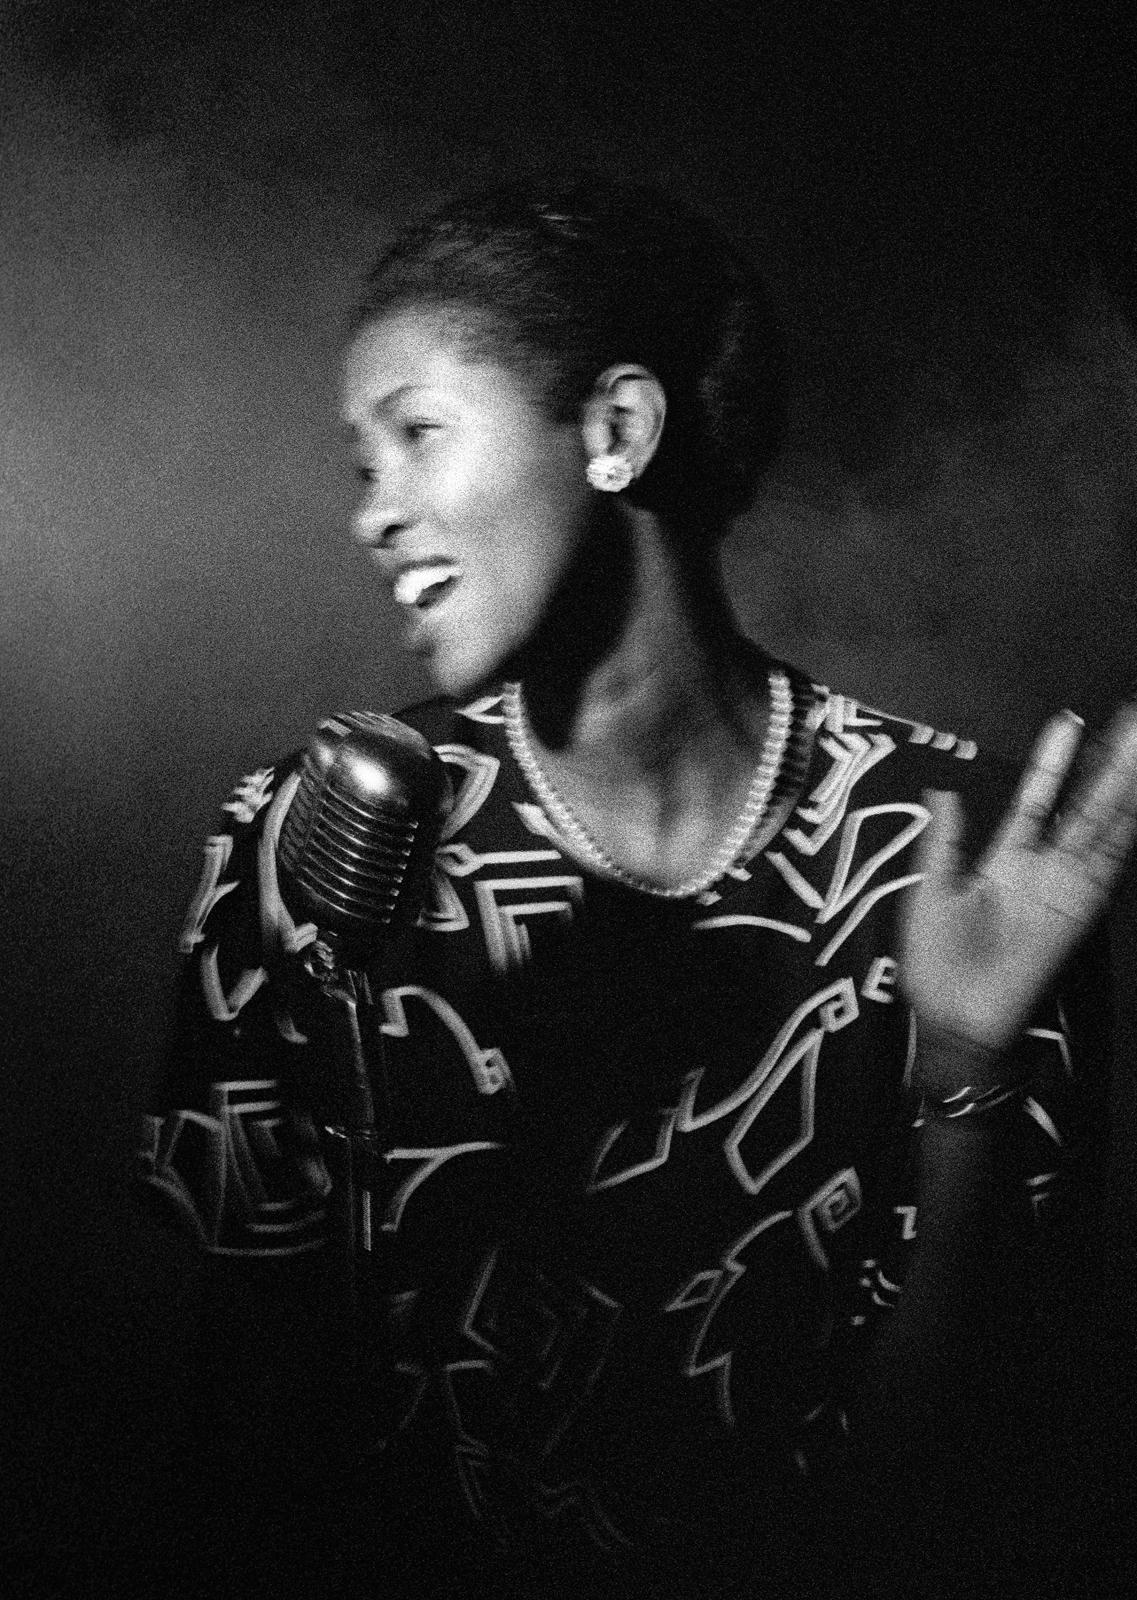 Lamu Jazz- Signed limited edition fine art print,Black and white photography